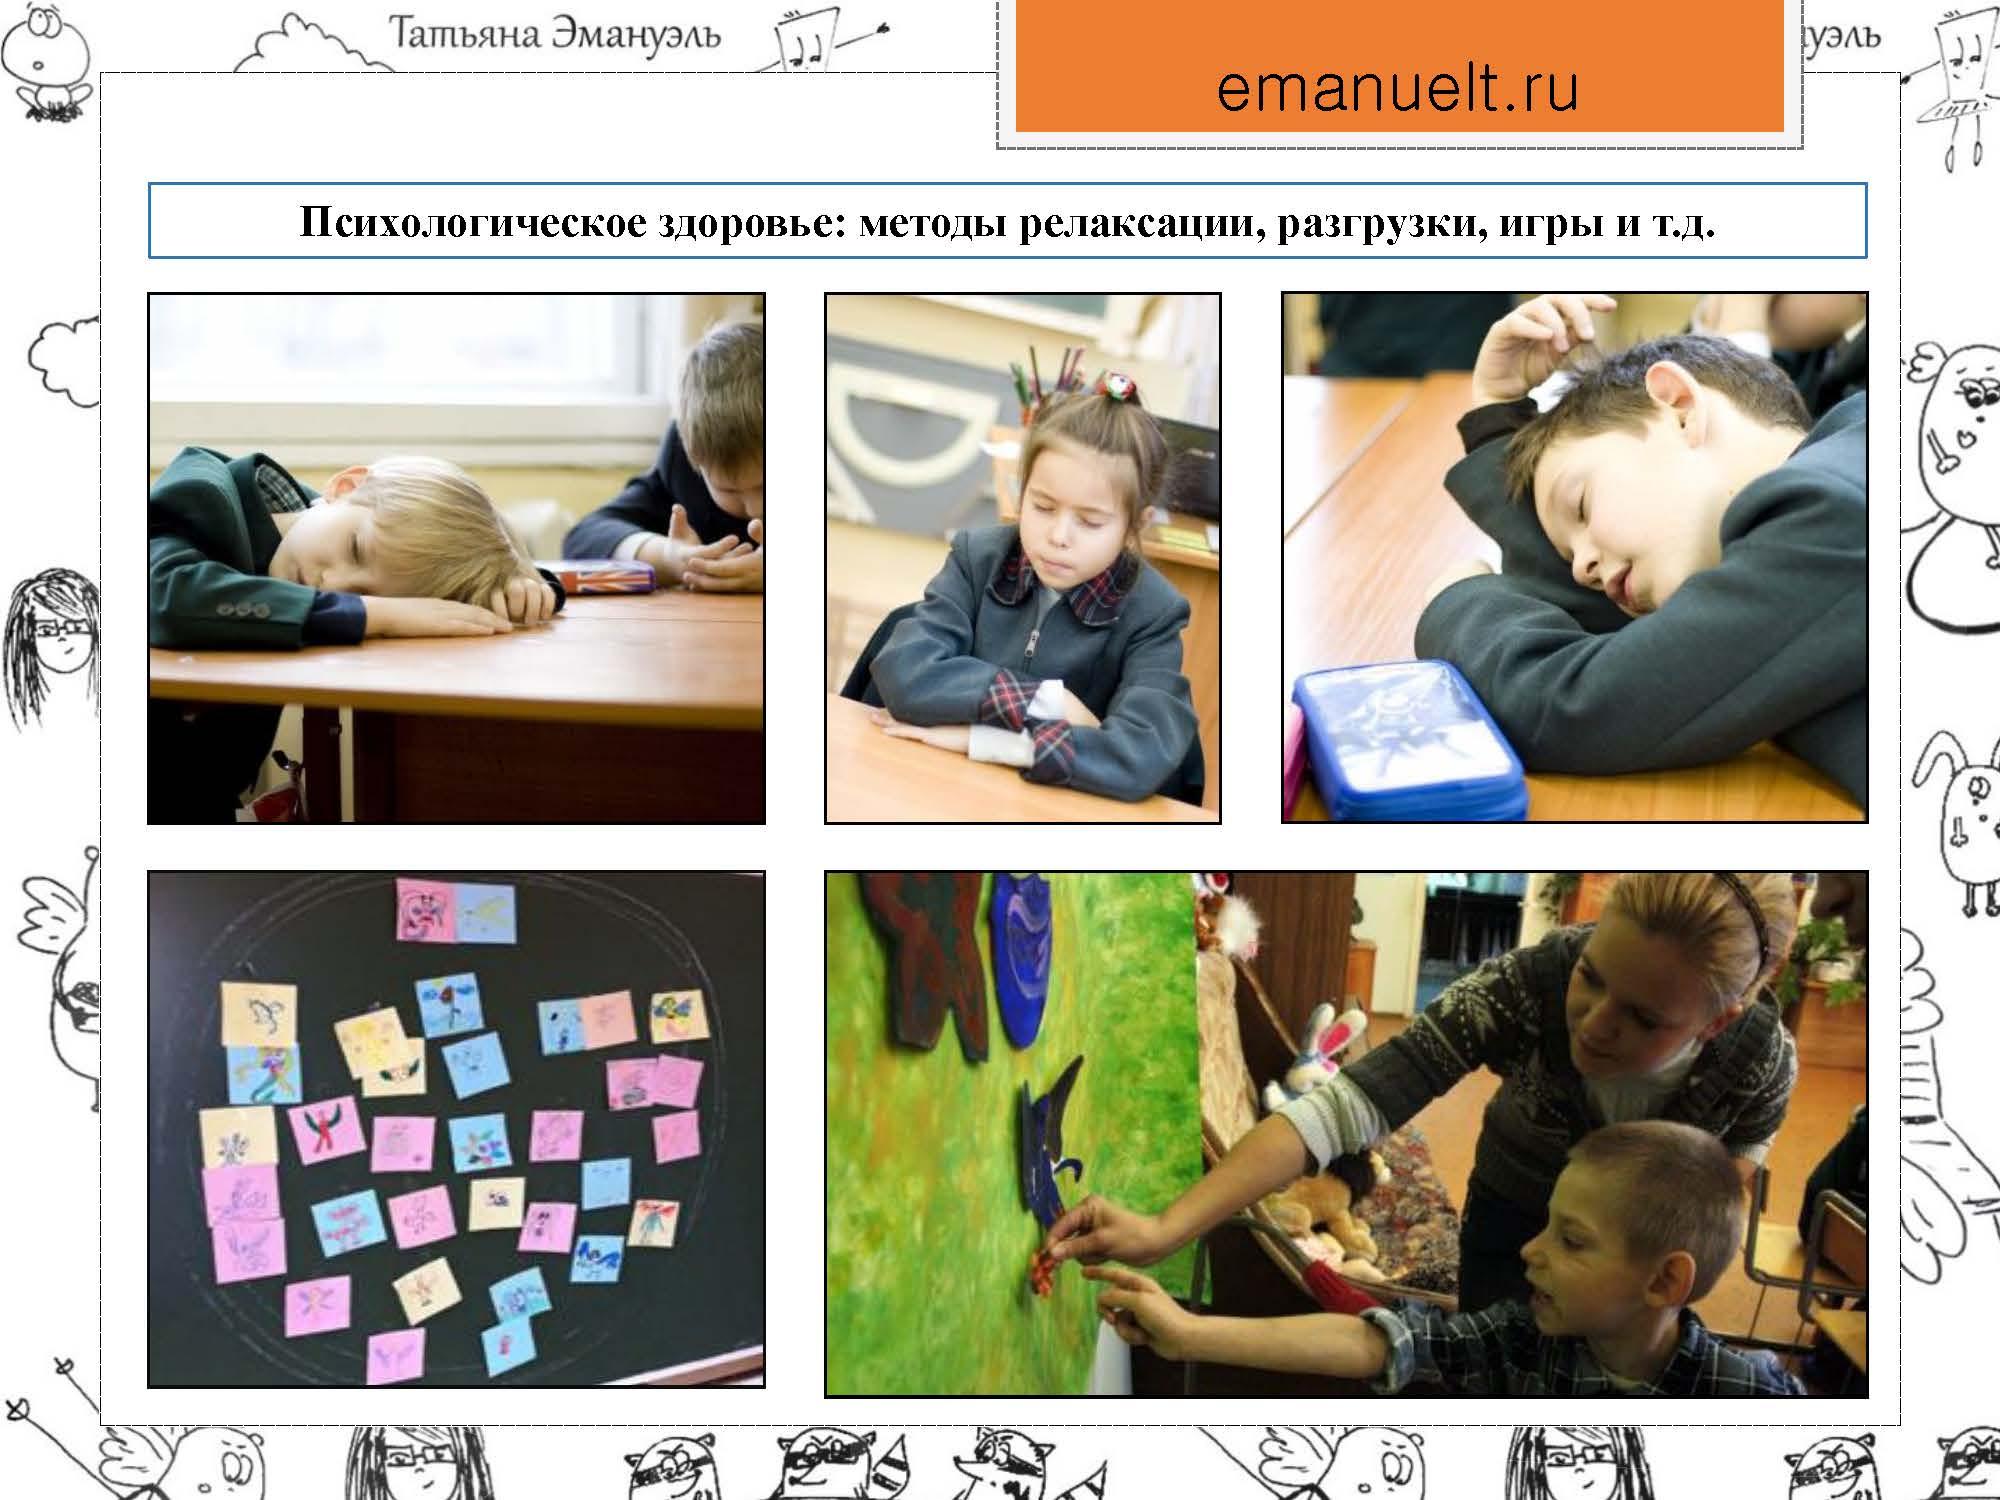 RazBeG_Emanuel_Страница_23